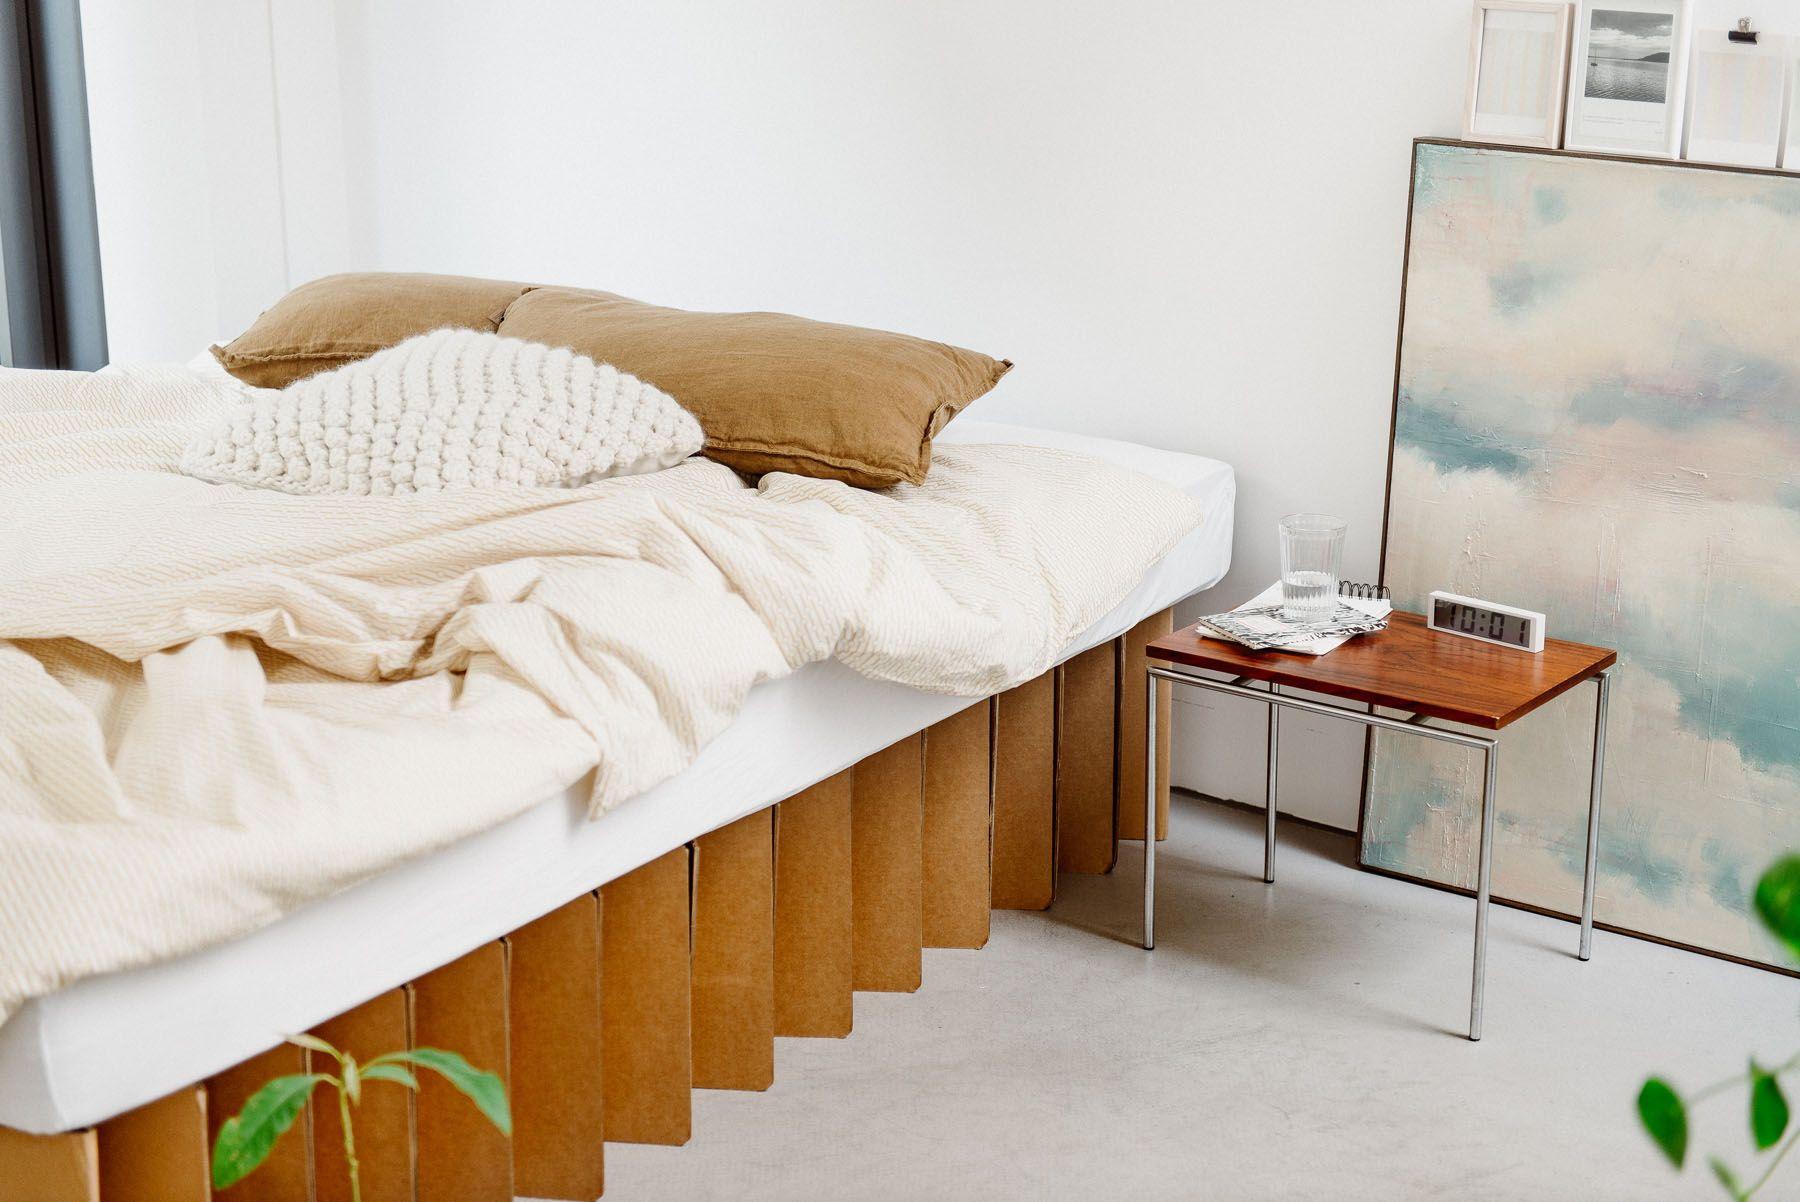 Nachhaltiges Bett 2 0 Aus Wellpappe Room In A Box Furniture Sustainable Furniture Home